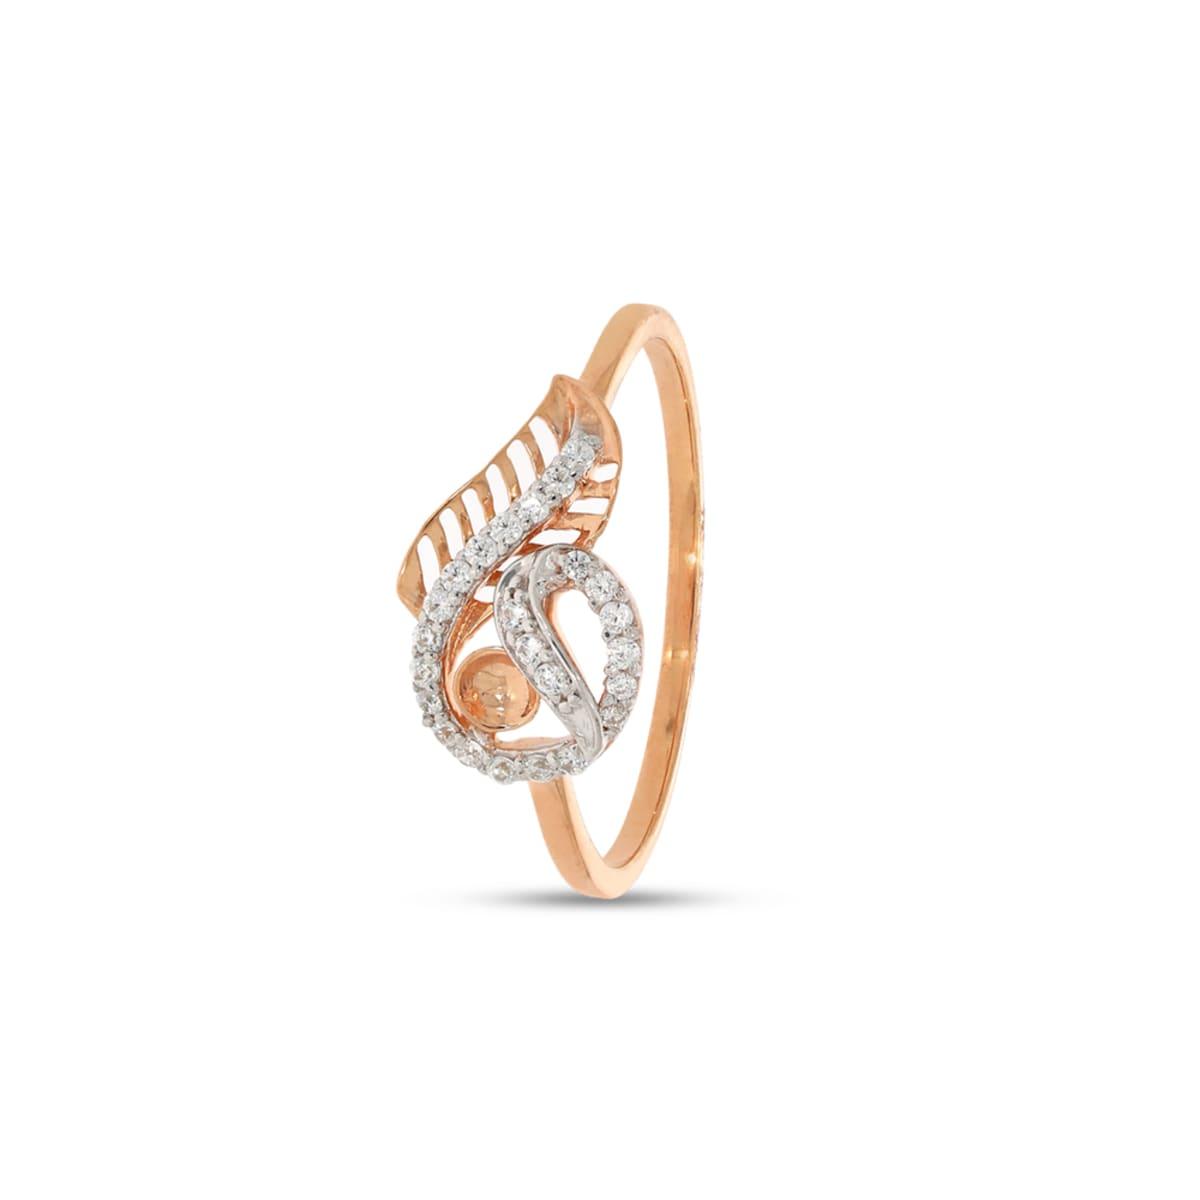 Real Diamond Ring 19